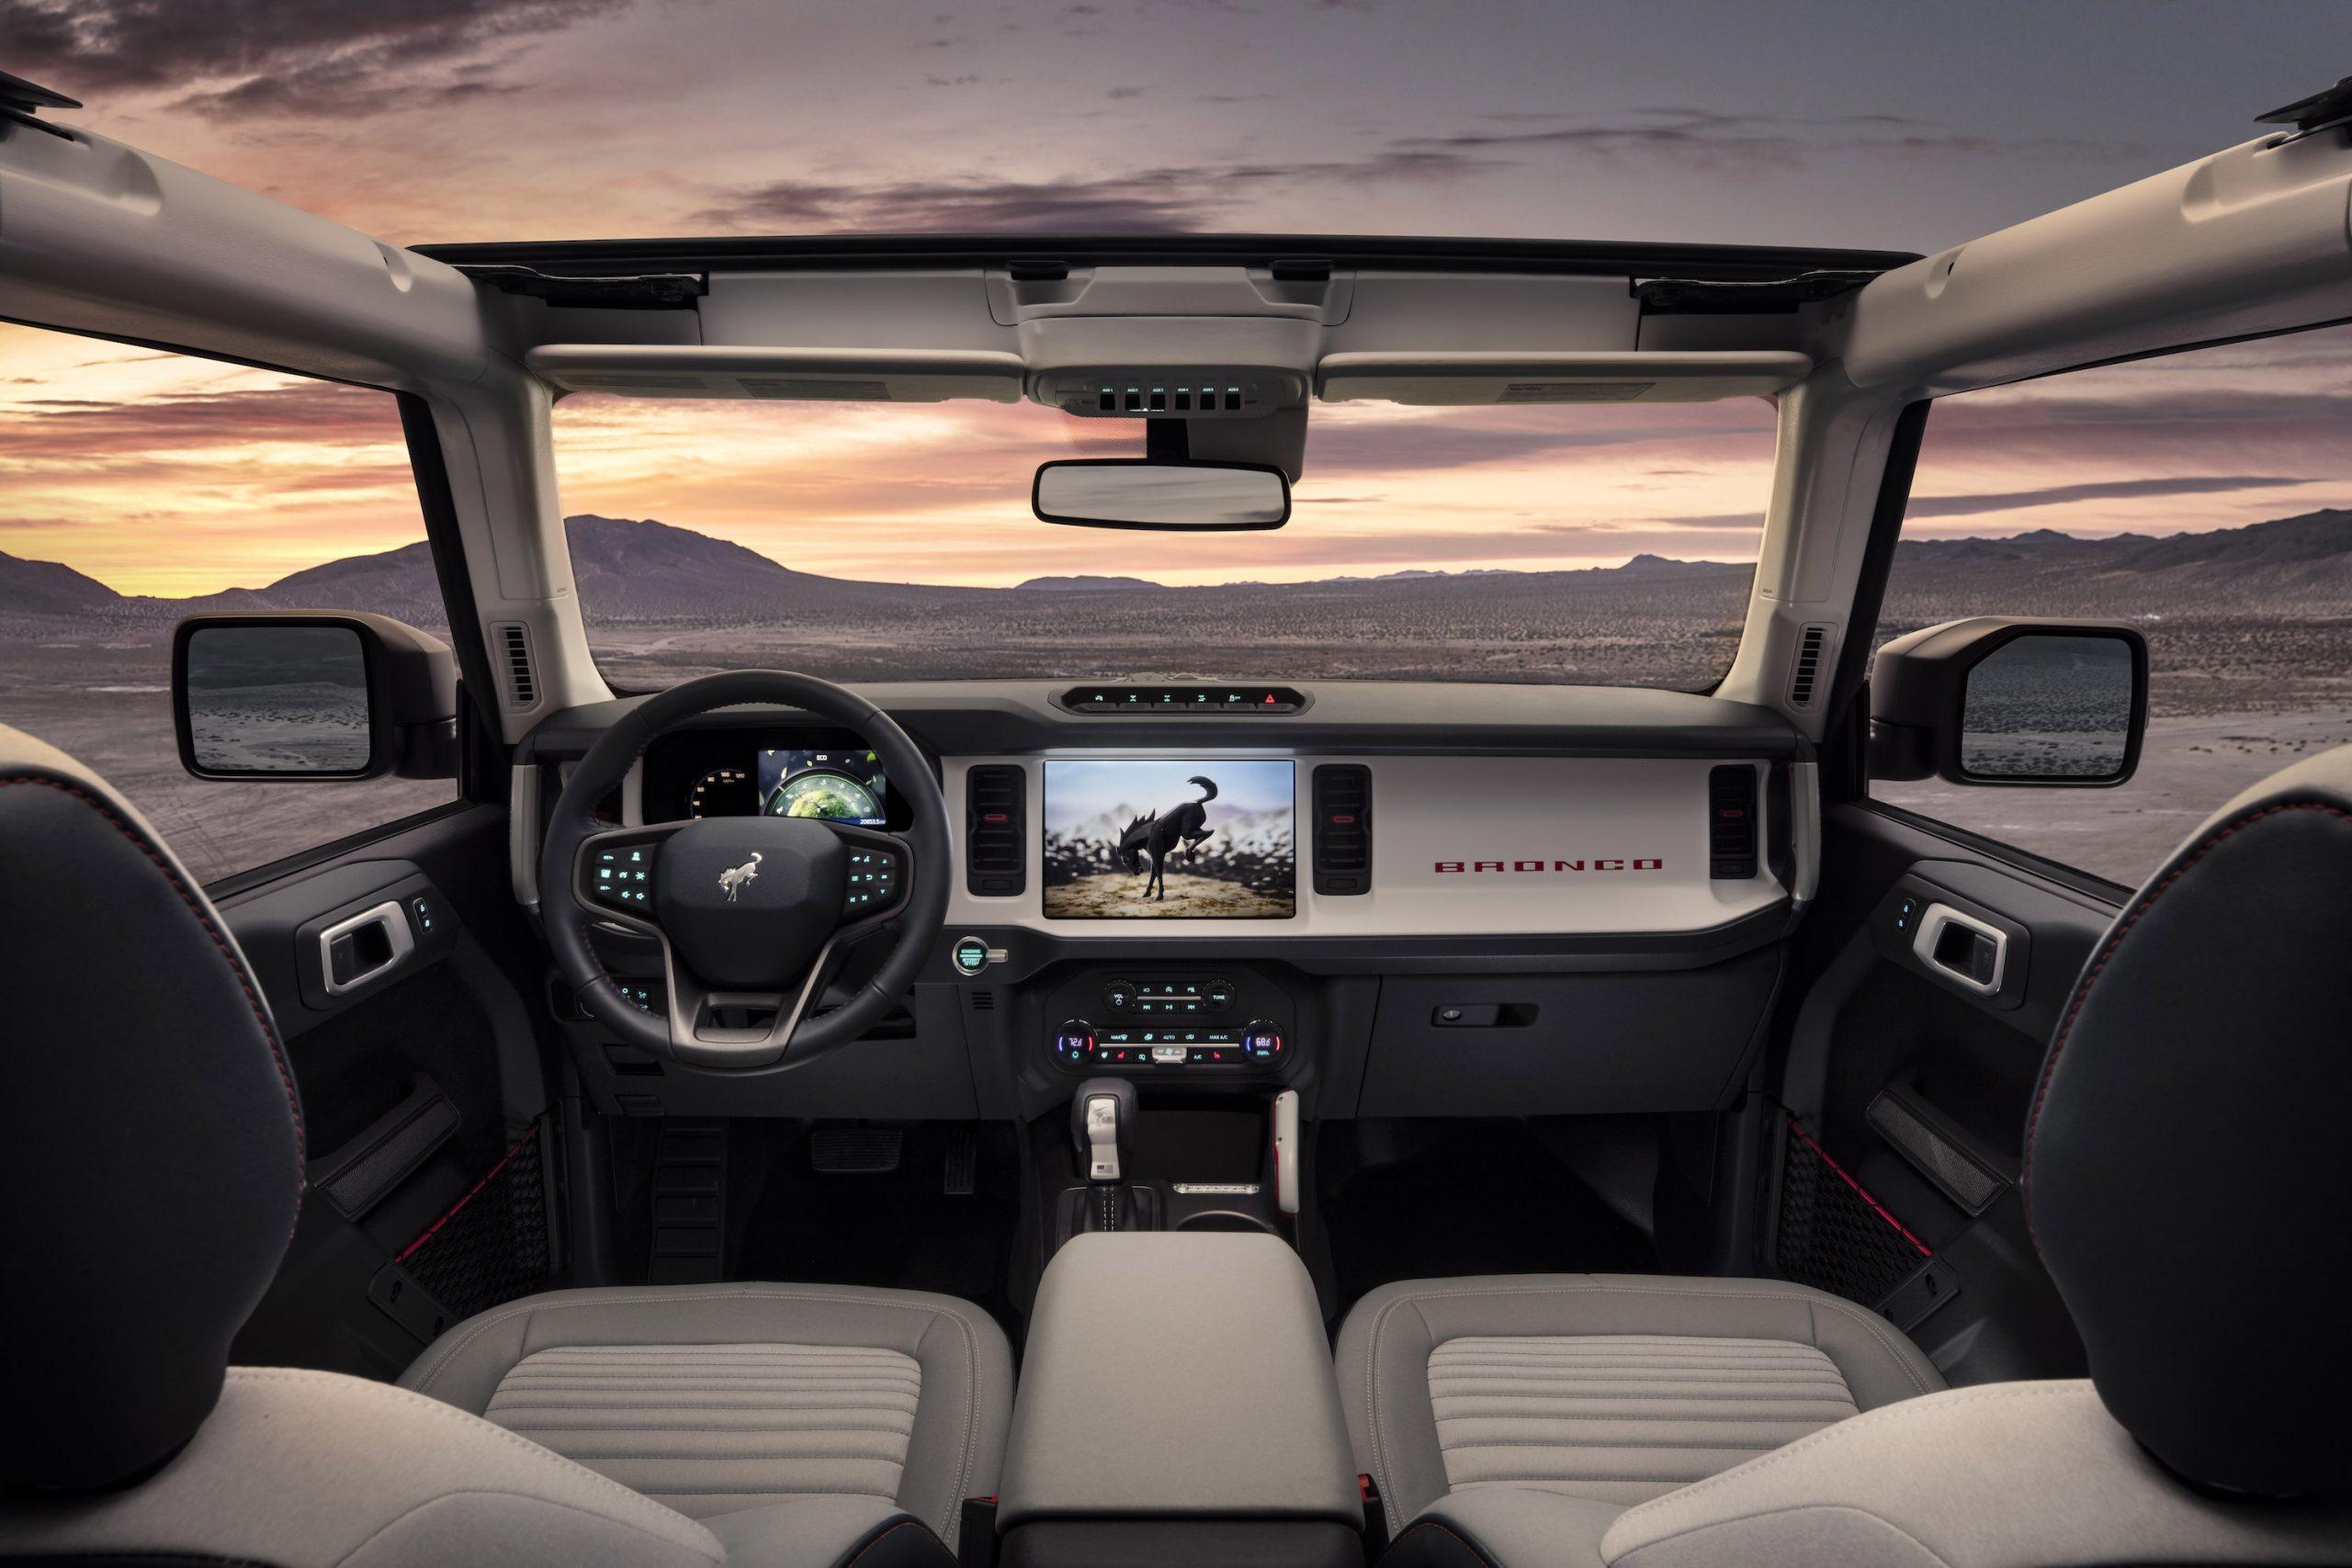 2021 Ford Bronco Four Door Interior Front